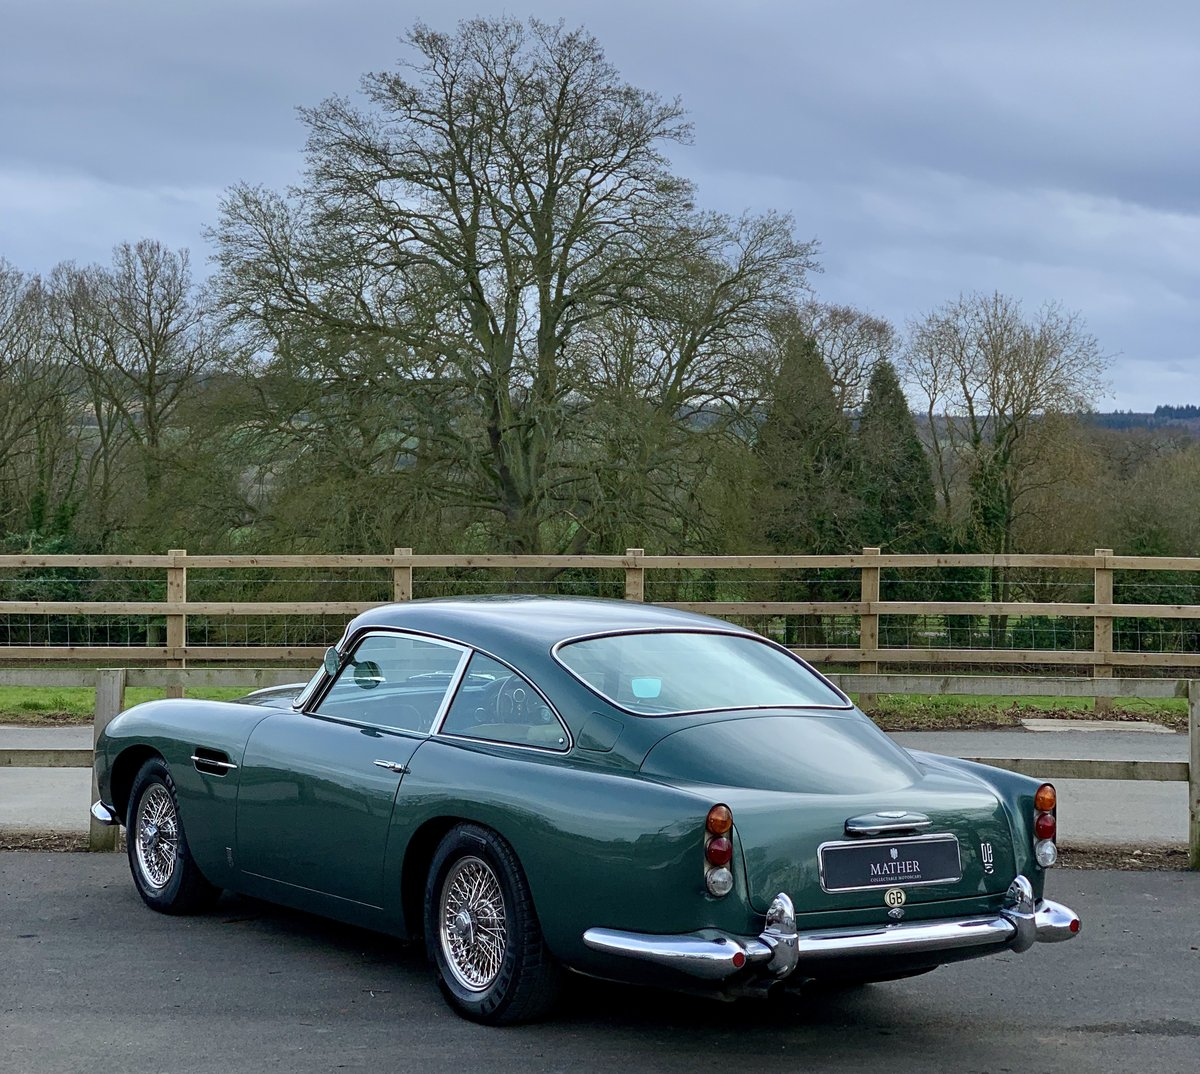 Aston Martin Db5: 1964 Aston Martin DB5 Coupe For Sale